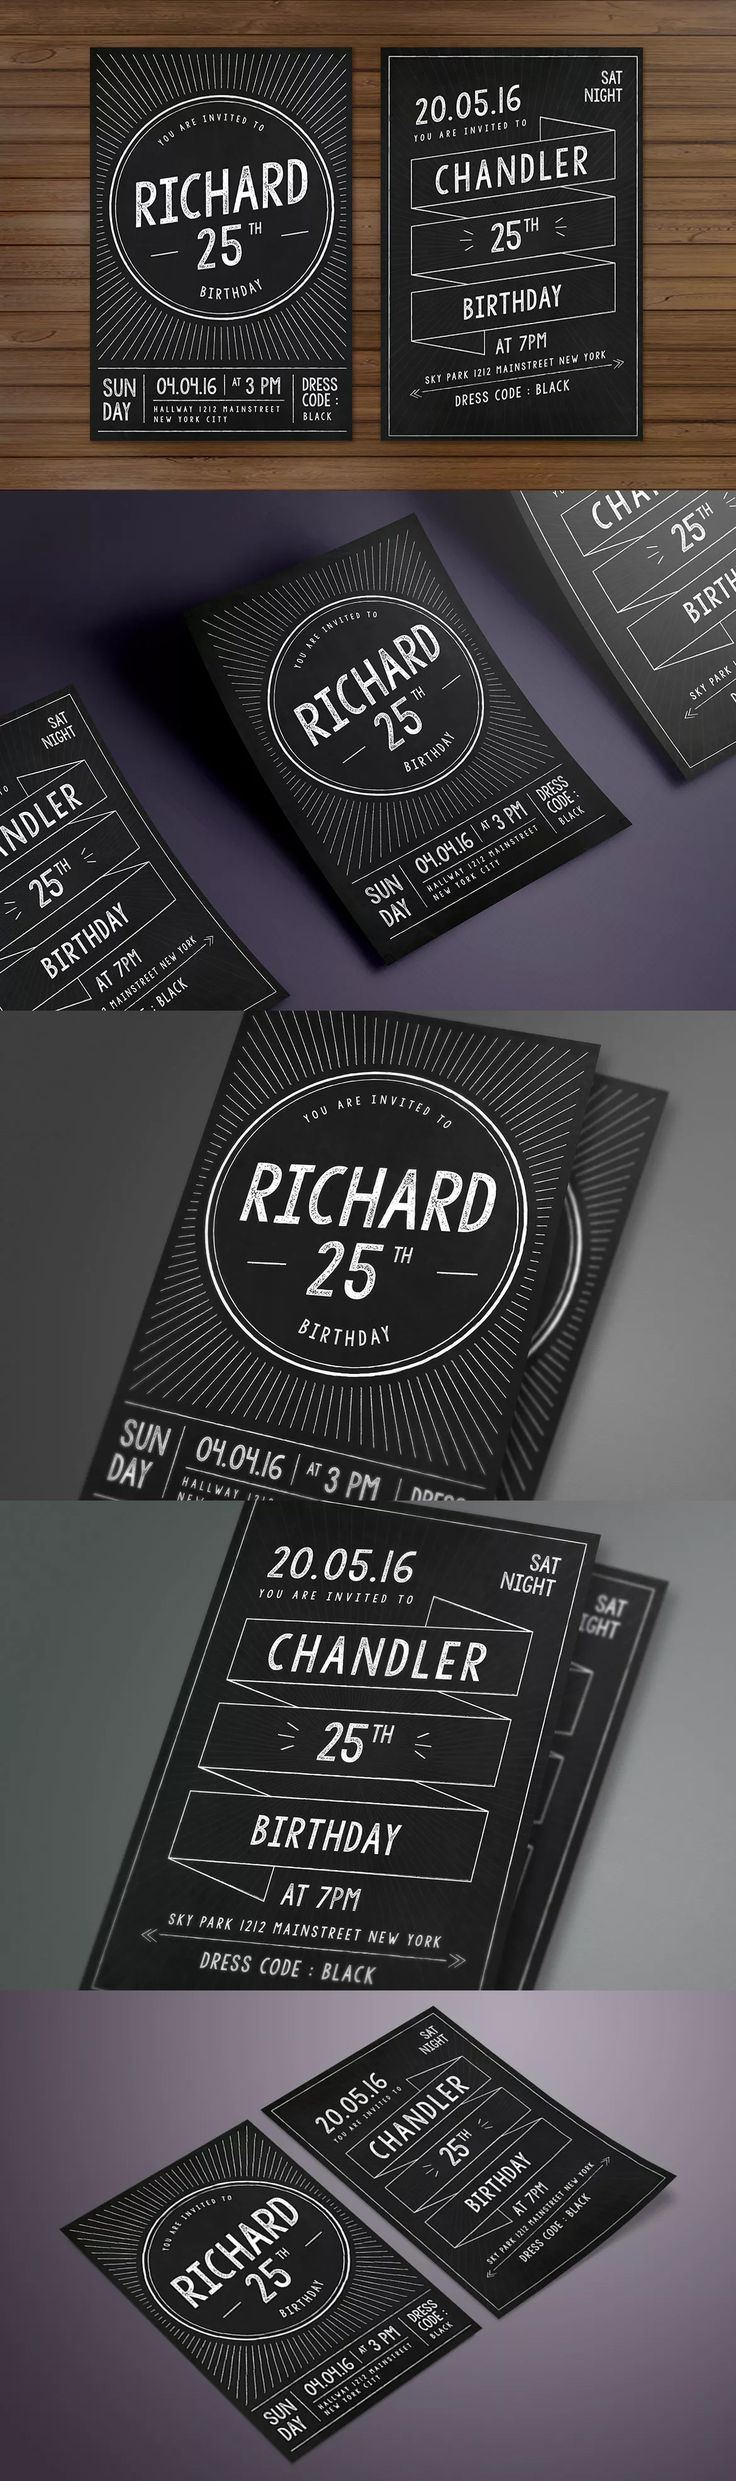 76 best Invitation Card Templates images on Pinterest